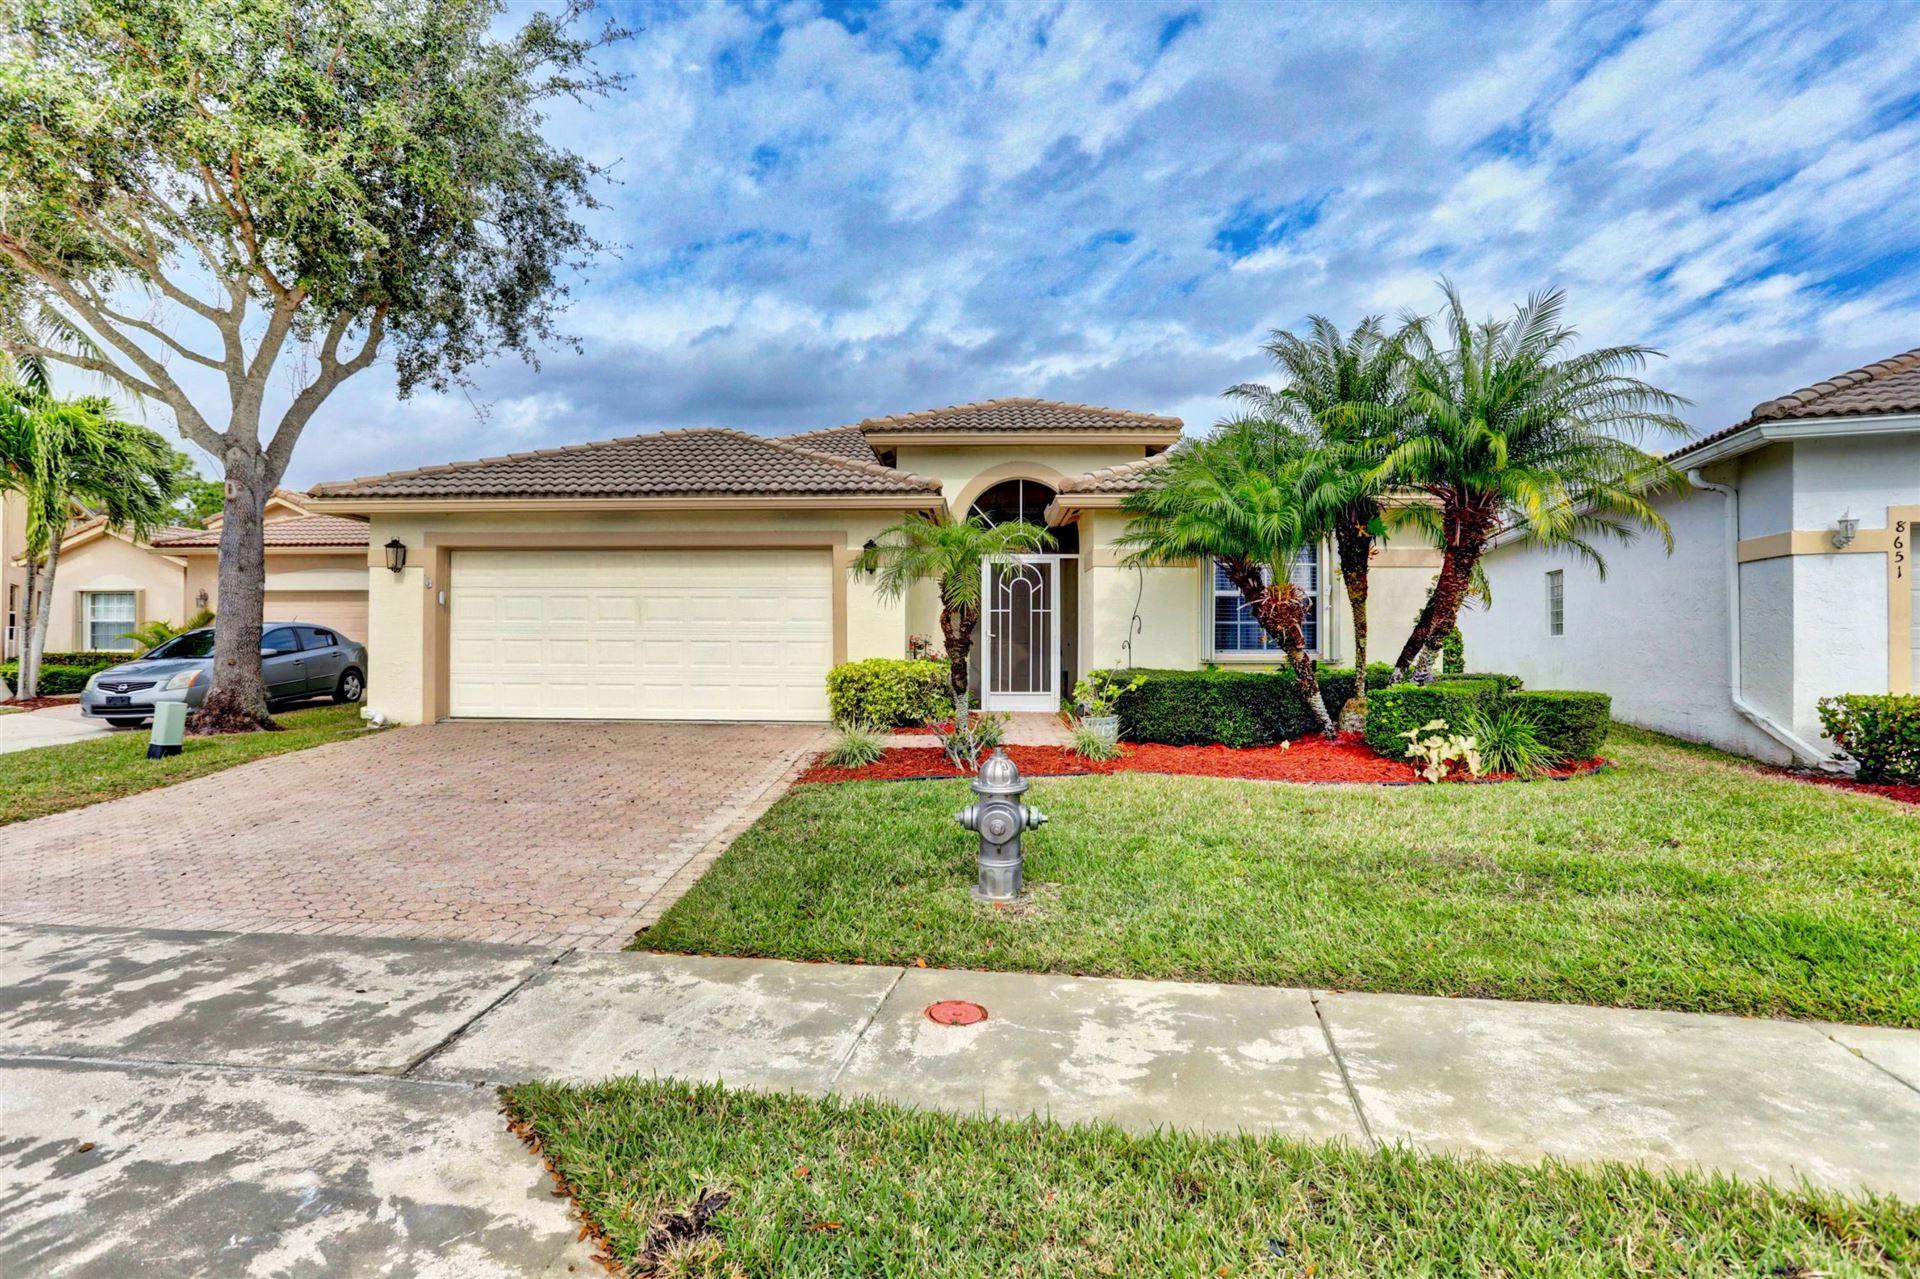 8661 Gold Cay, West Palm Beach, FL 33411 - #: RX-10685305